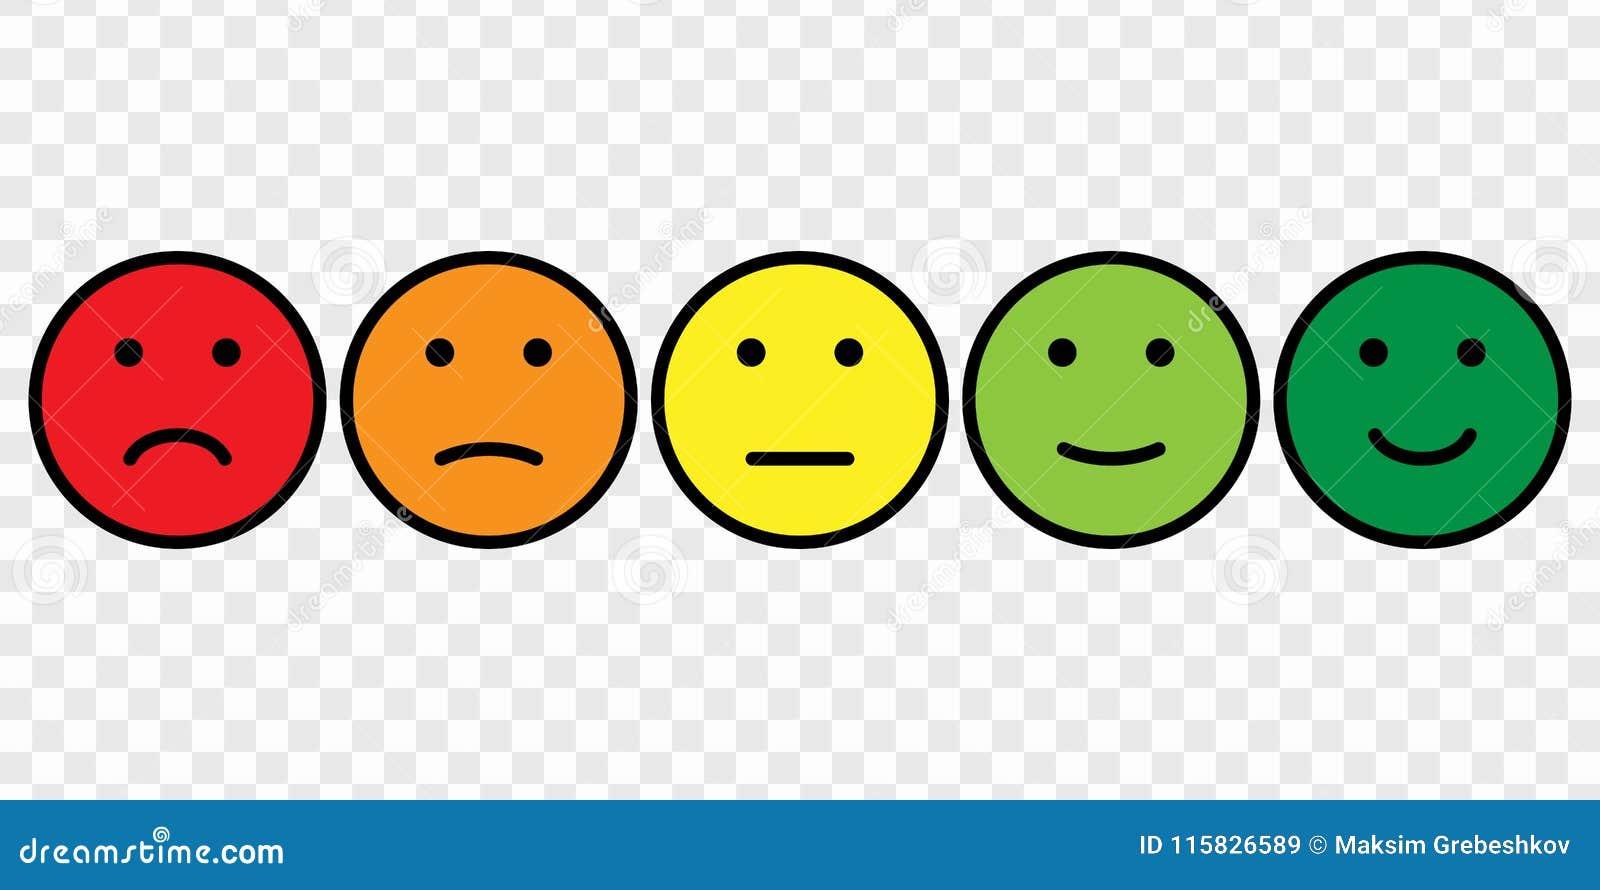 Smiley Face Icon Set